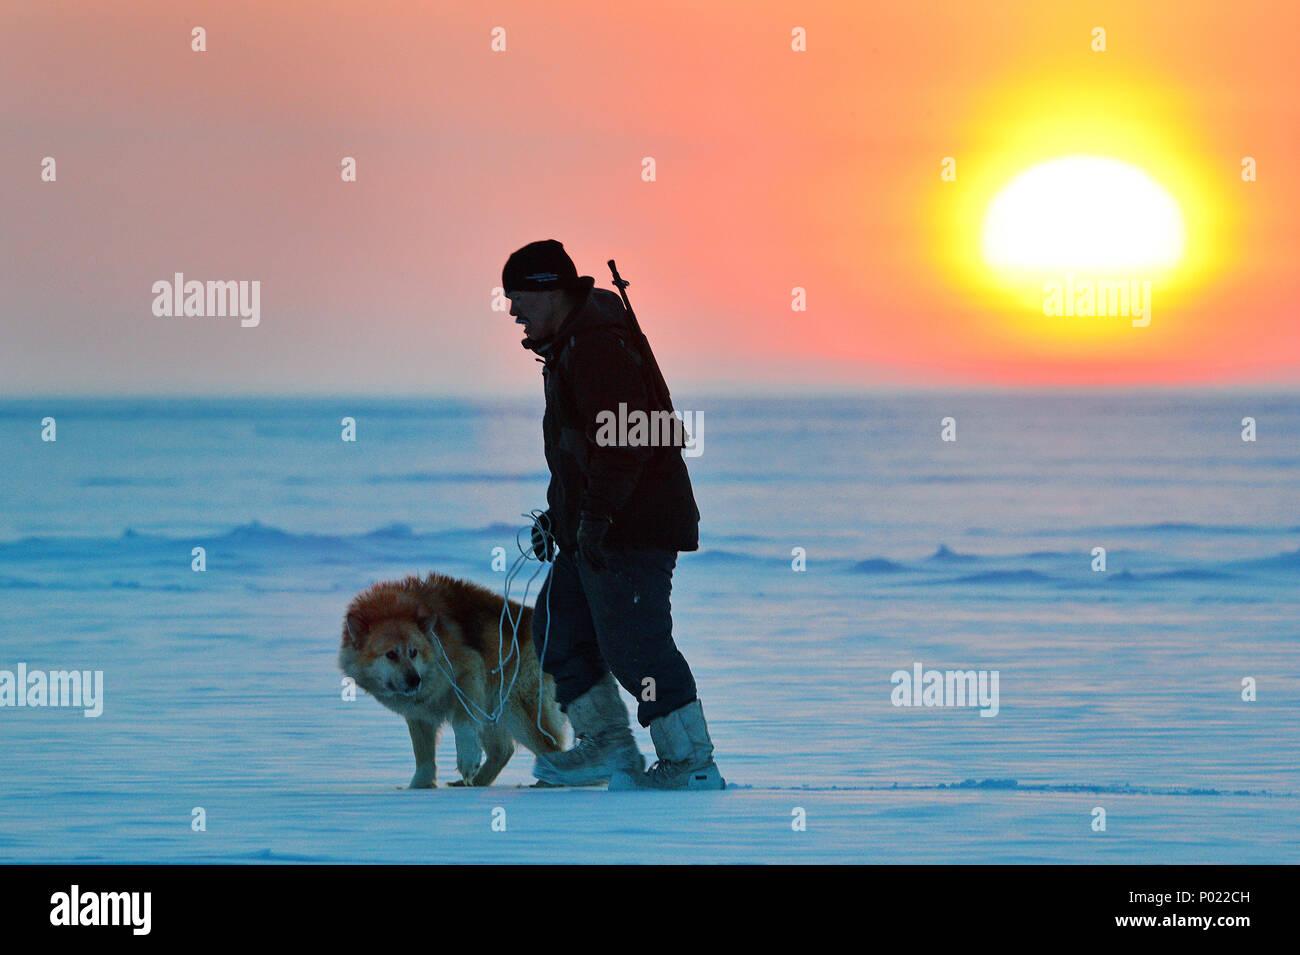 Bewaffneter Inuit mit Husky, Sonnenuntergang im Nunavut Territorium, Kanada | Armed Inuit with Husky, sunset at Nunavut teritorry, Canada - Stock Image